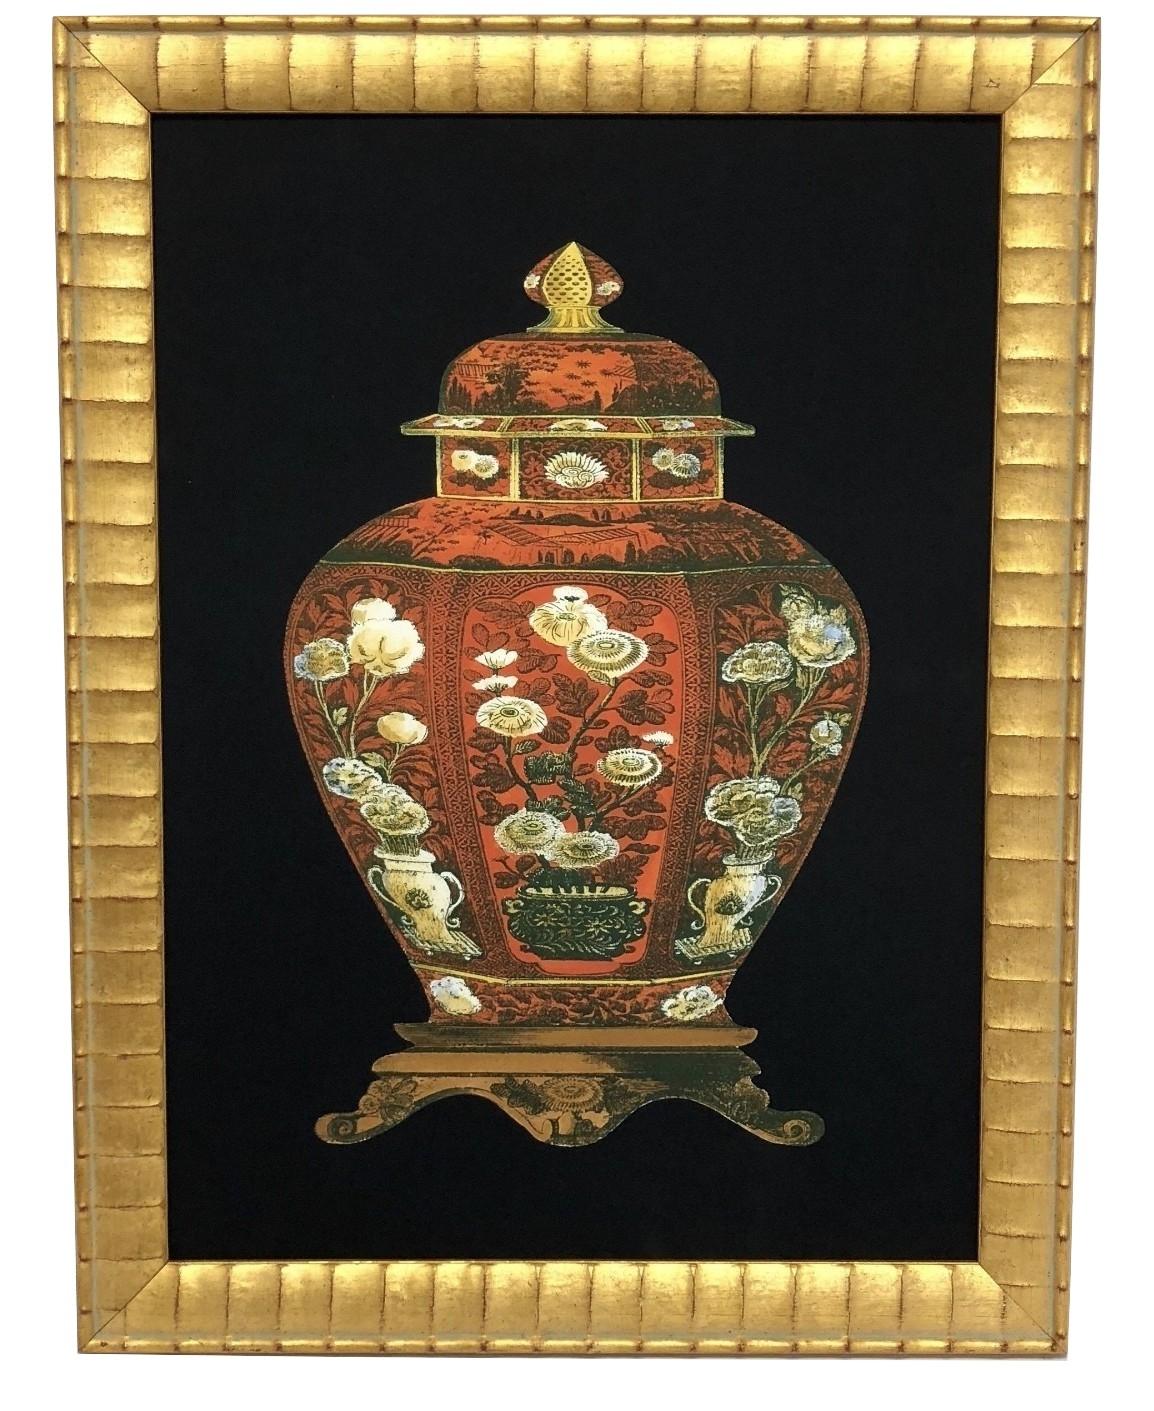 NEW! Incredible framed red ginger jar print #1